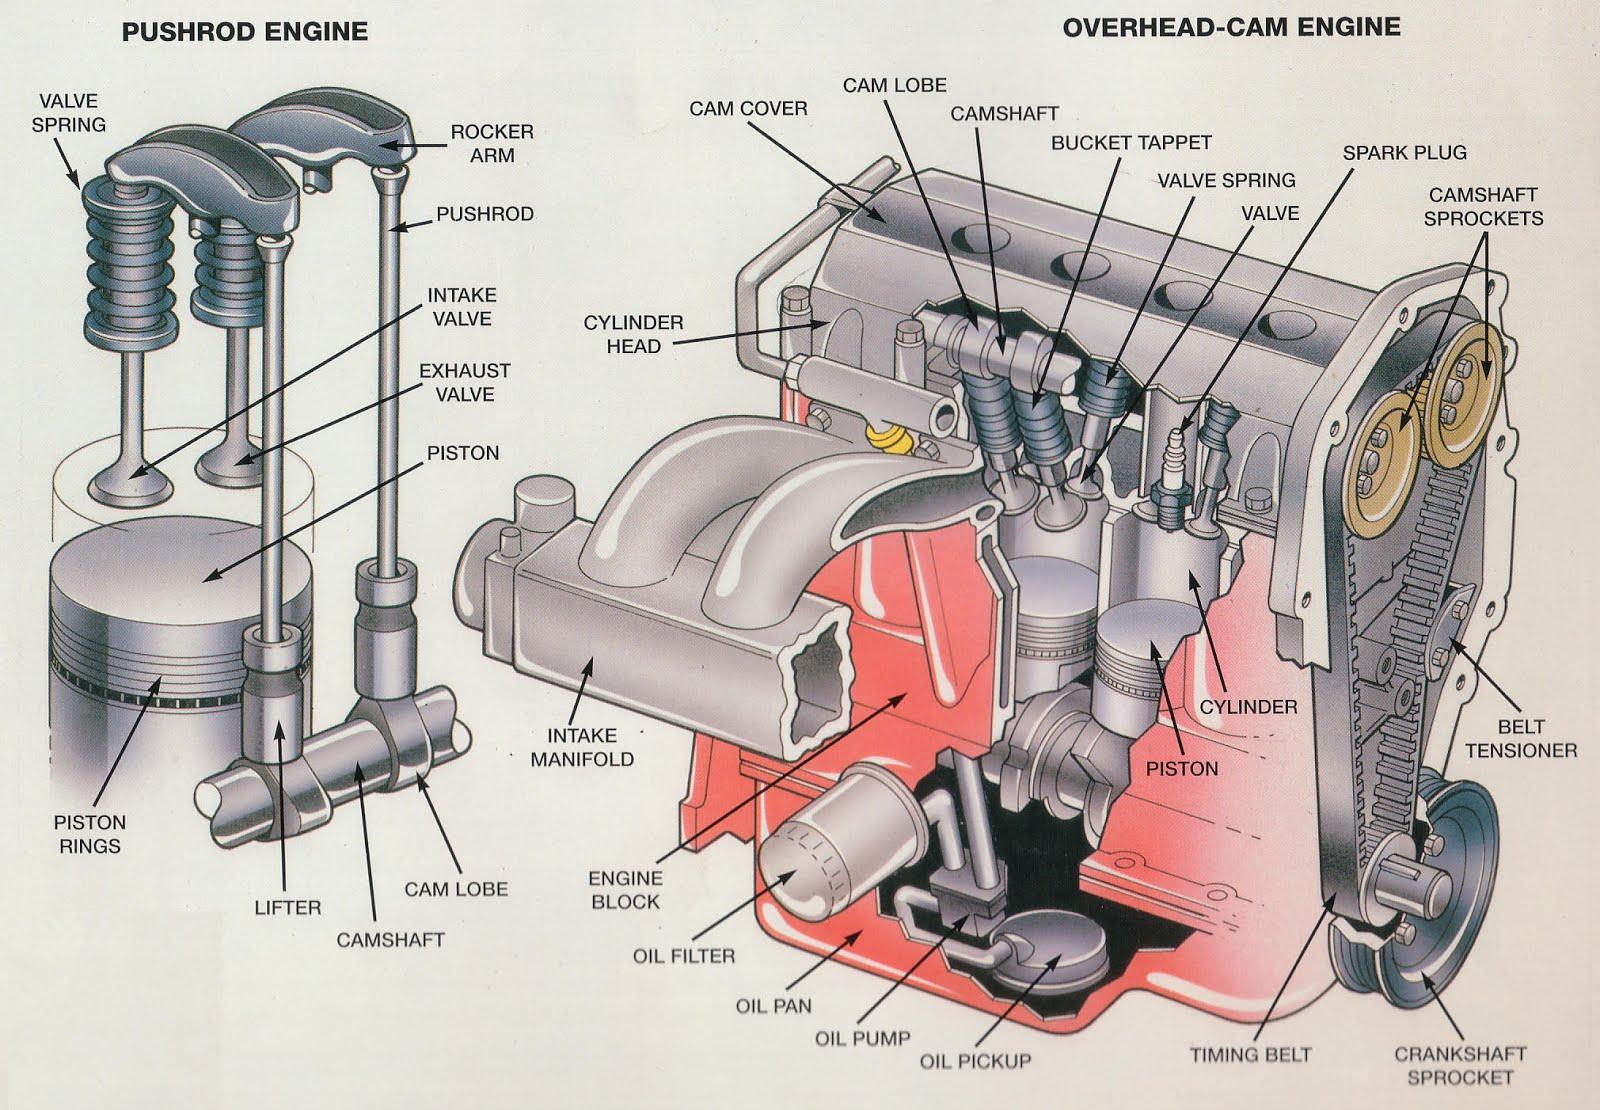 medium resolution of single overhead cam engine diagram cylinder piston engine flathead motor overhead valve engine diagram